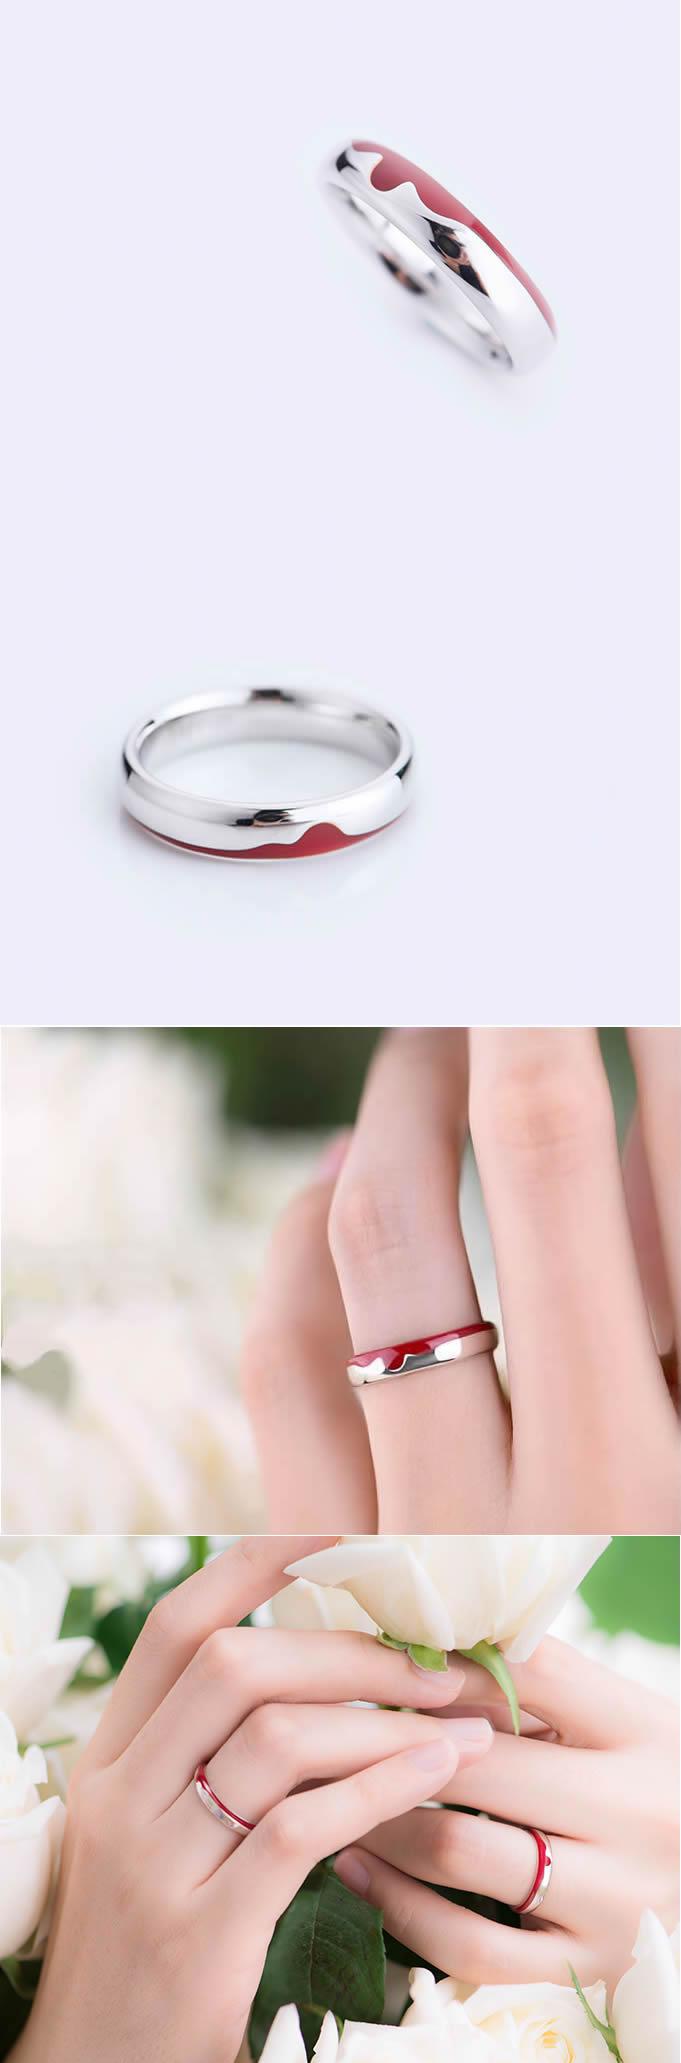 True Blood Ring | &TrueBlood | Pinterest | Blood and Ring